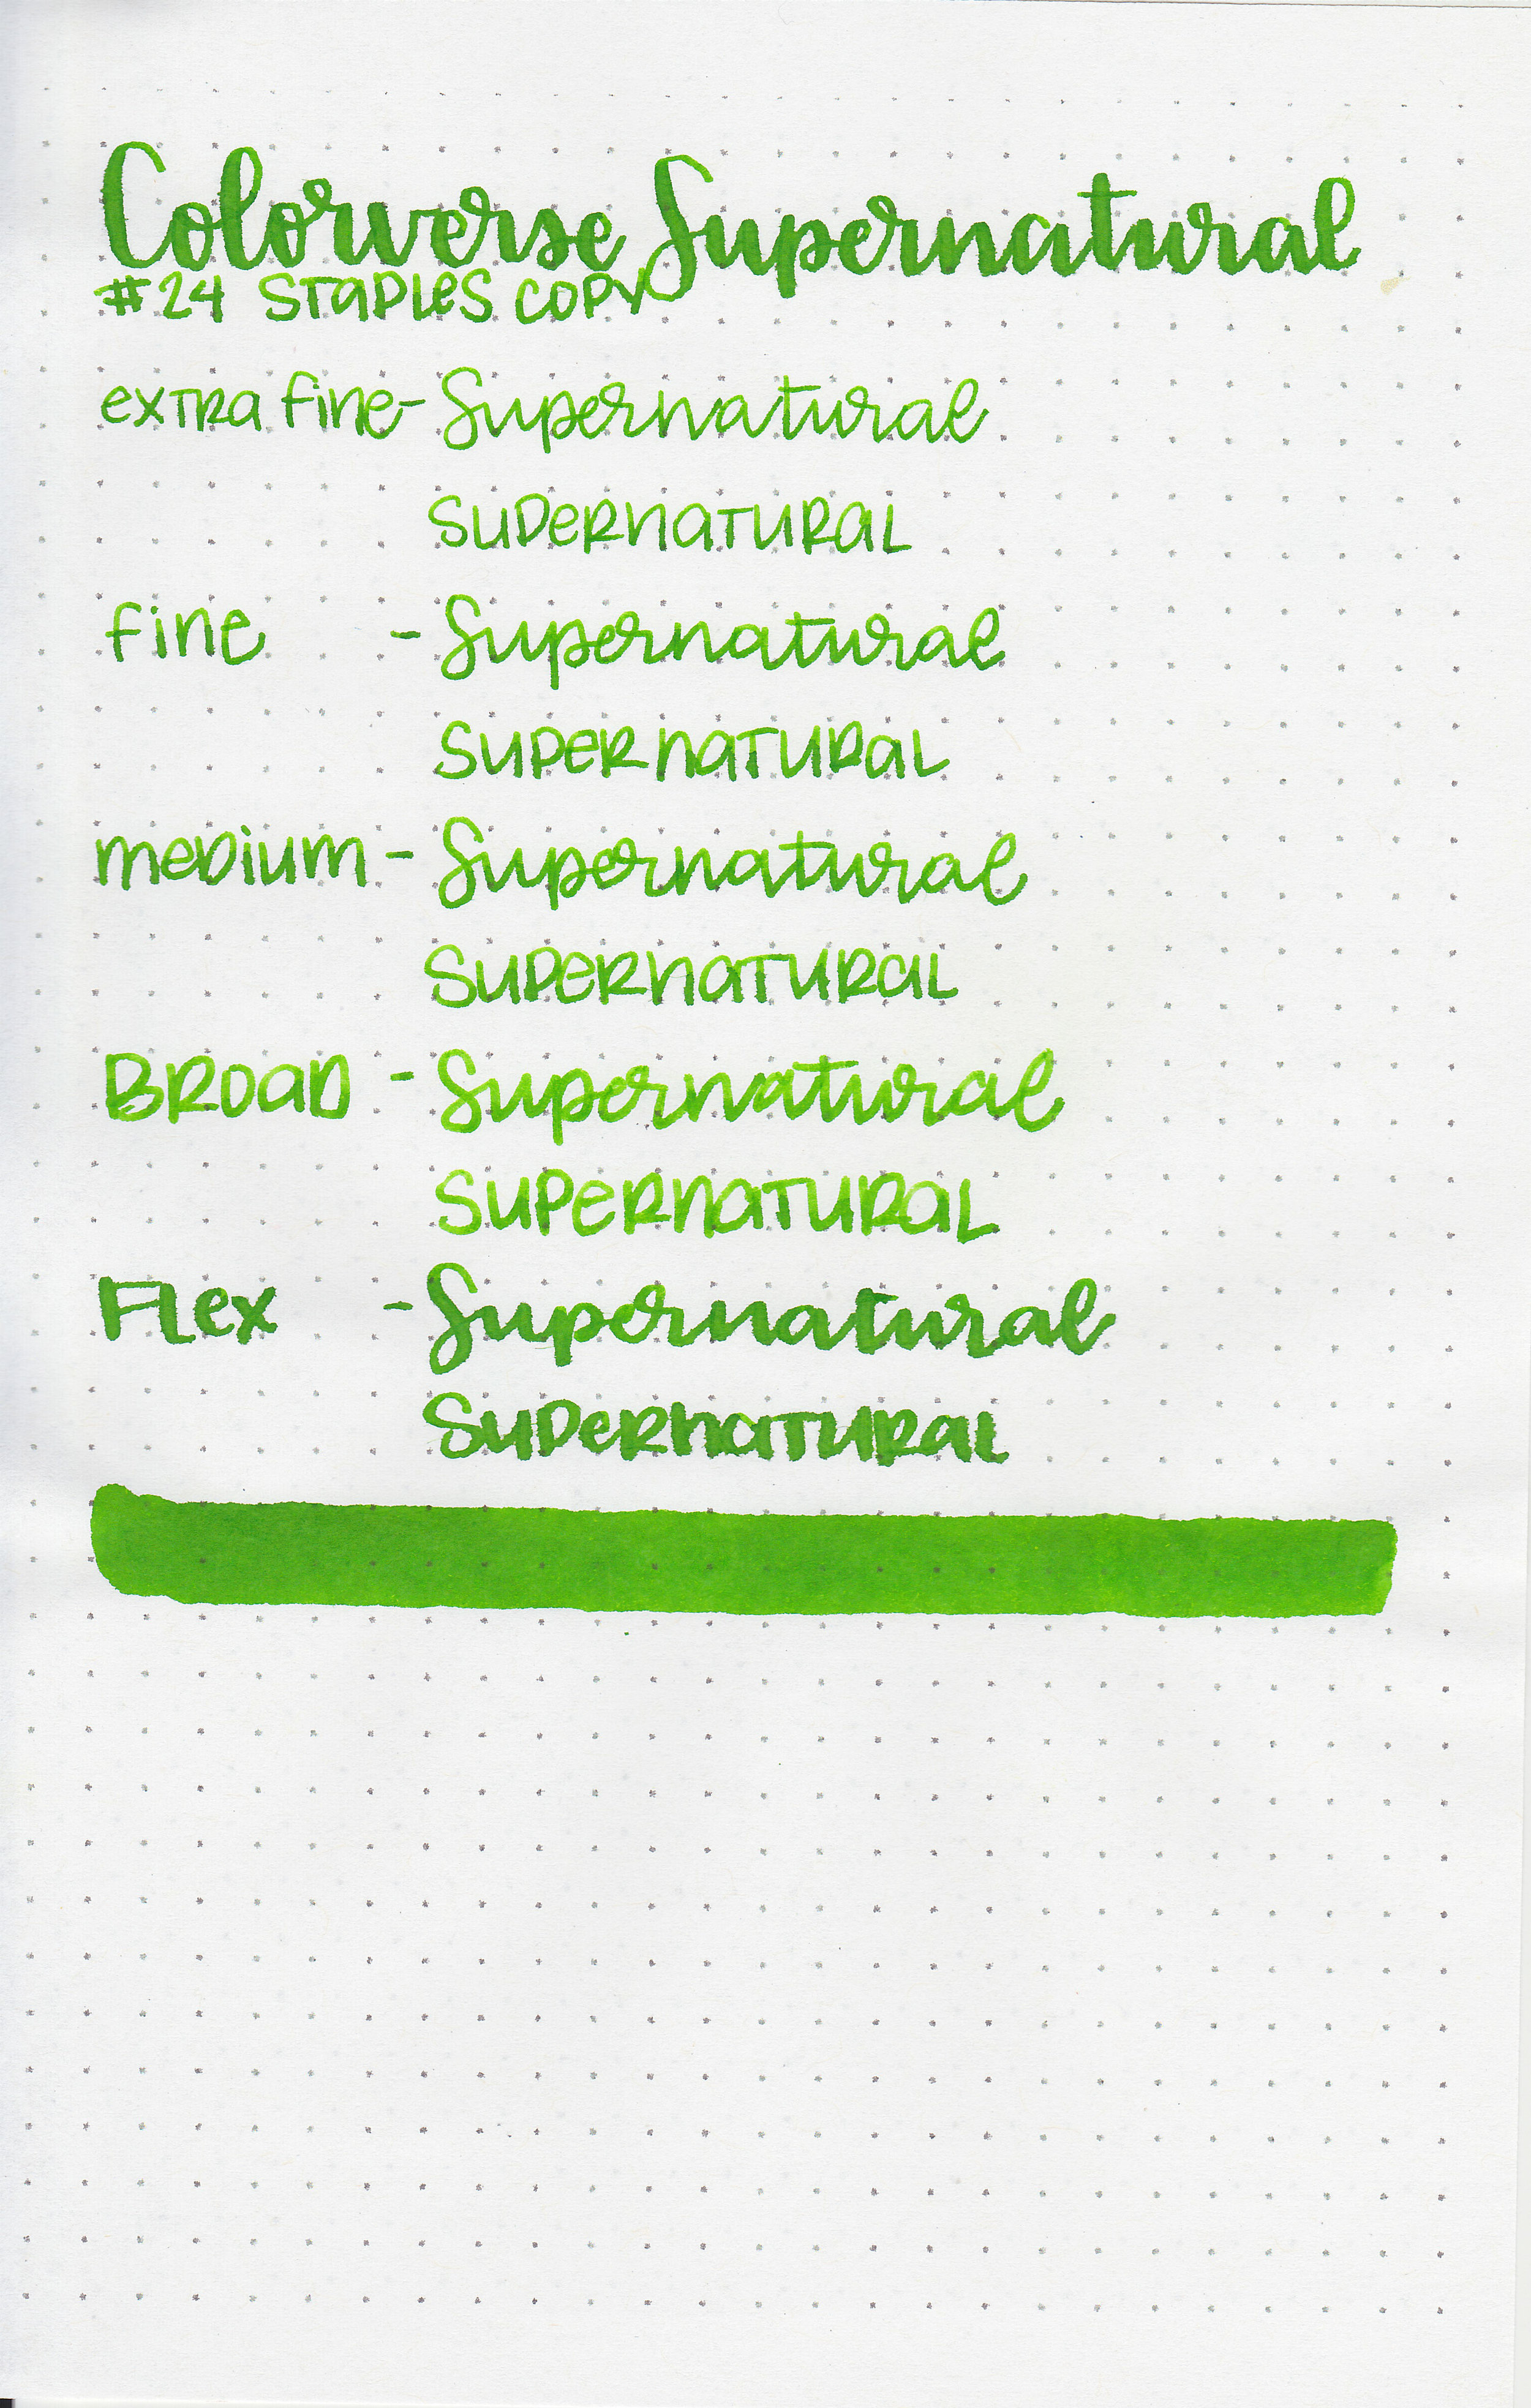 cv-supernatural-11.jpg